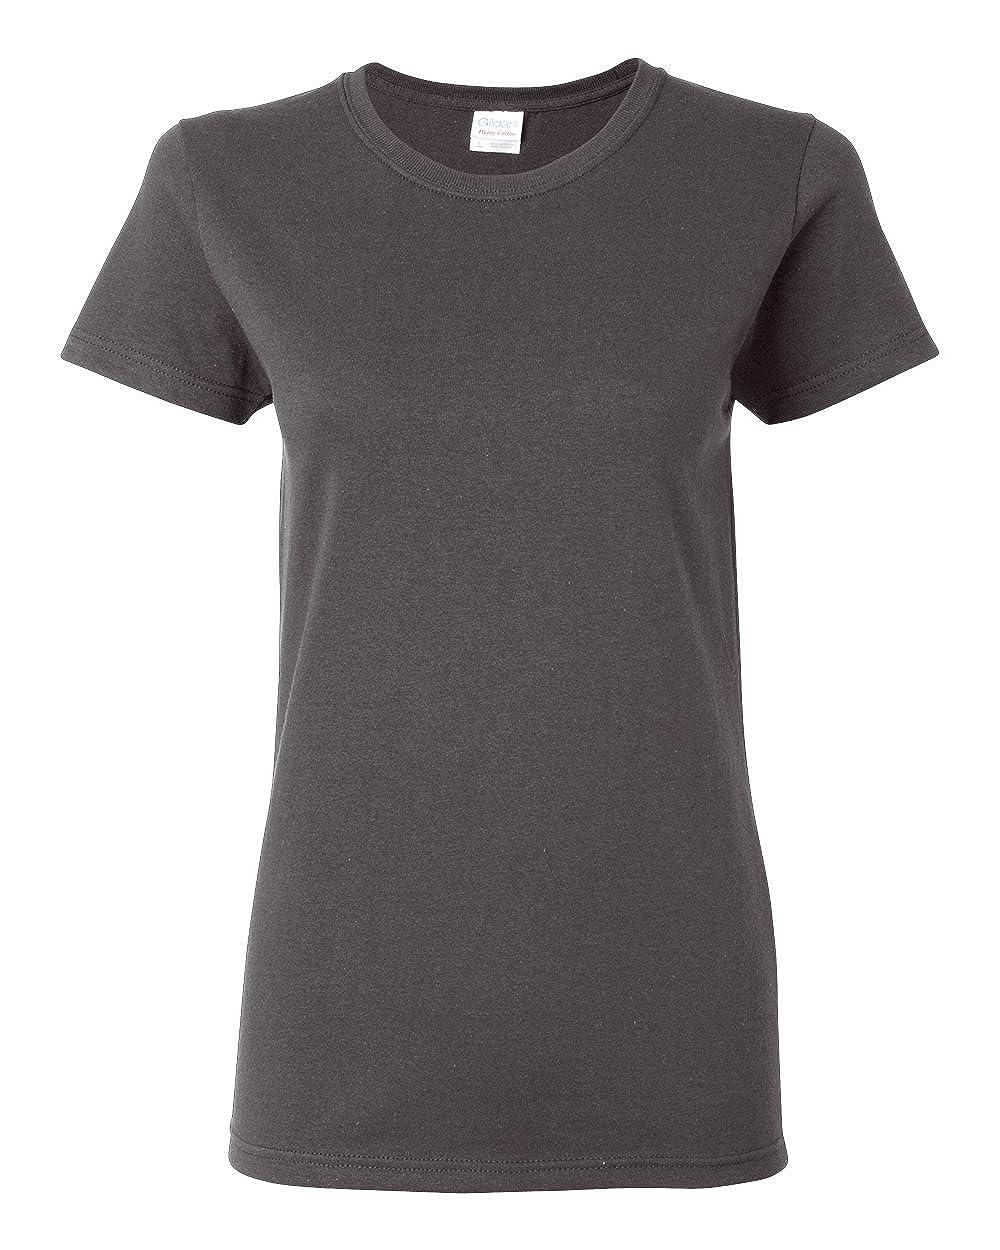 Charcoal Gildan Womens 5.3 oz. Heavy Cotton Missy Fit TShirt G500L (Pack of 12)